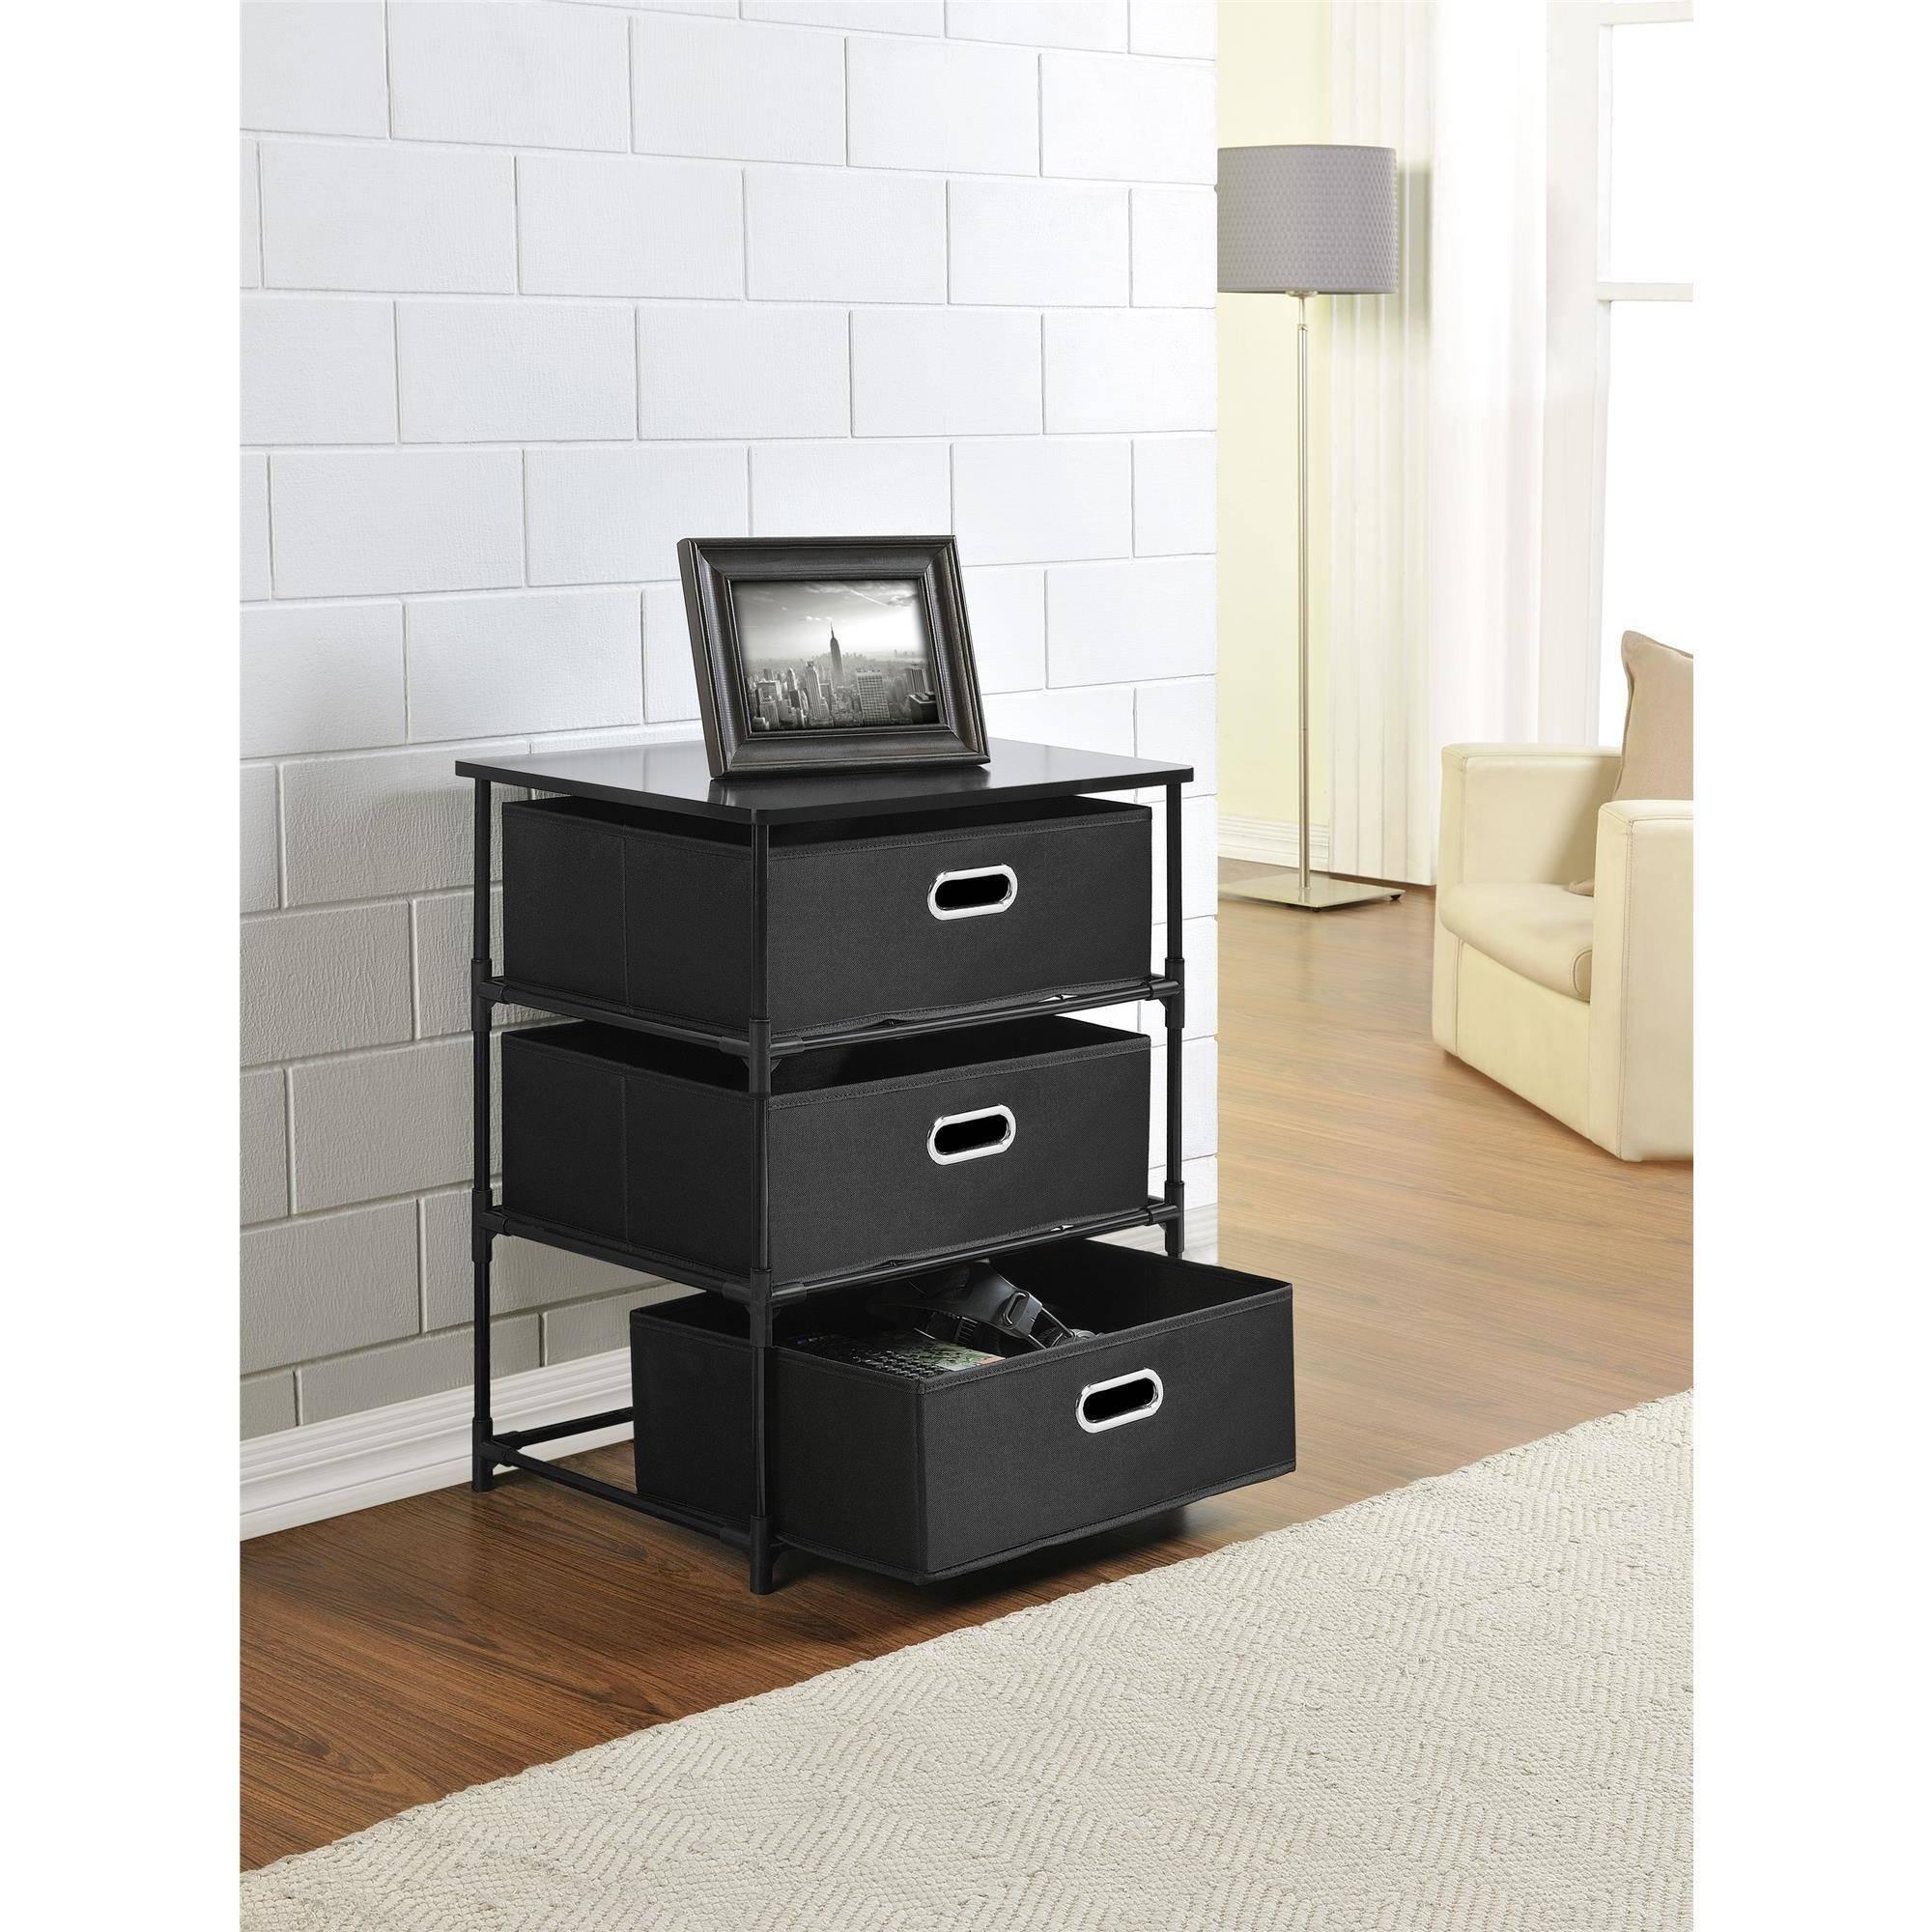 Ameriwood Home Sidney 3 Bin Storage End Table Black